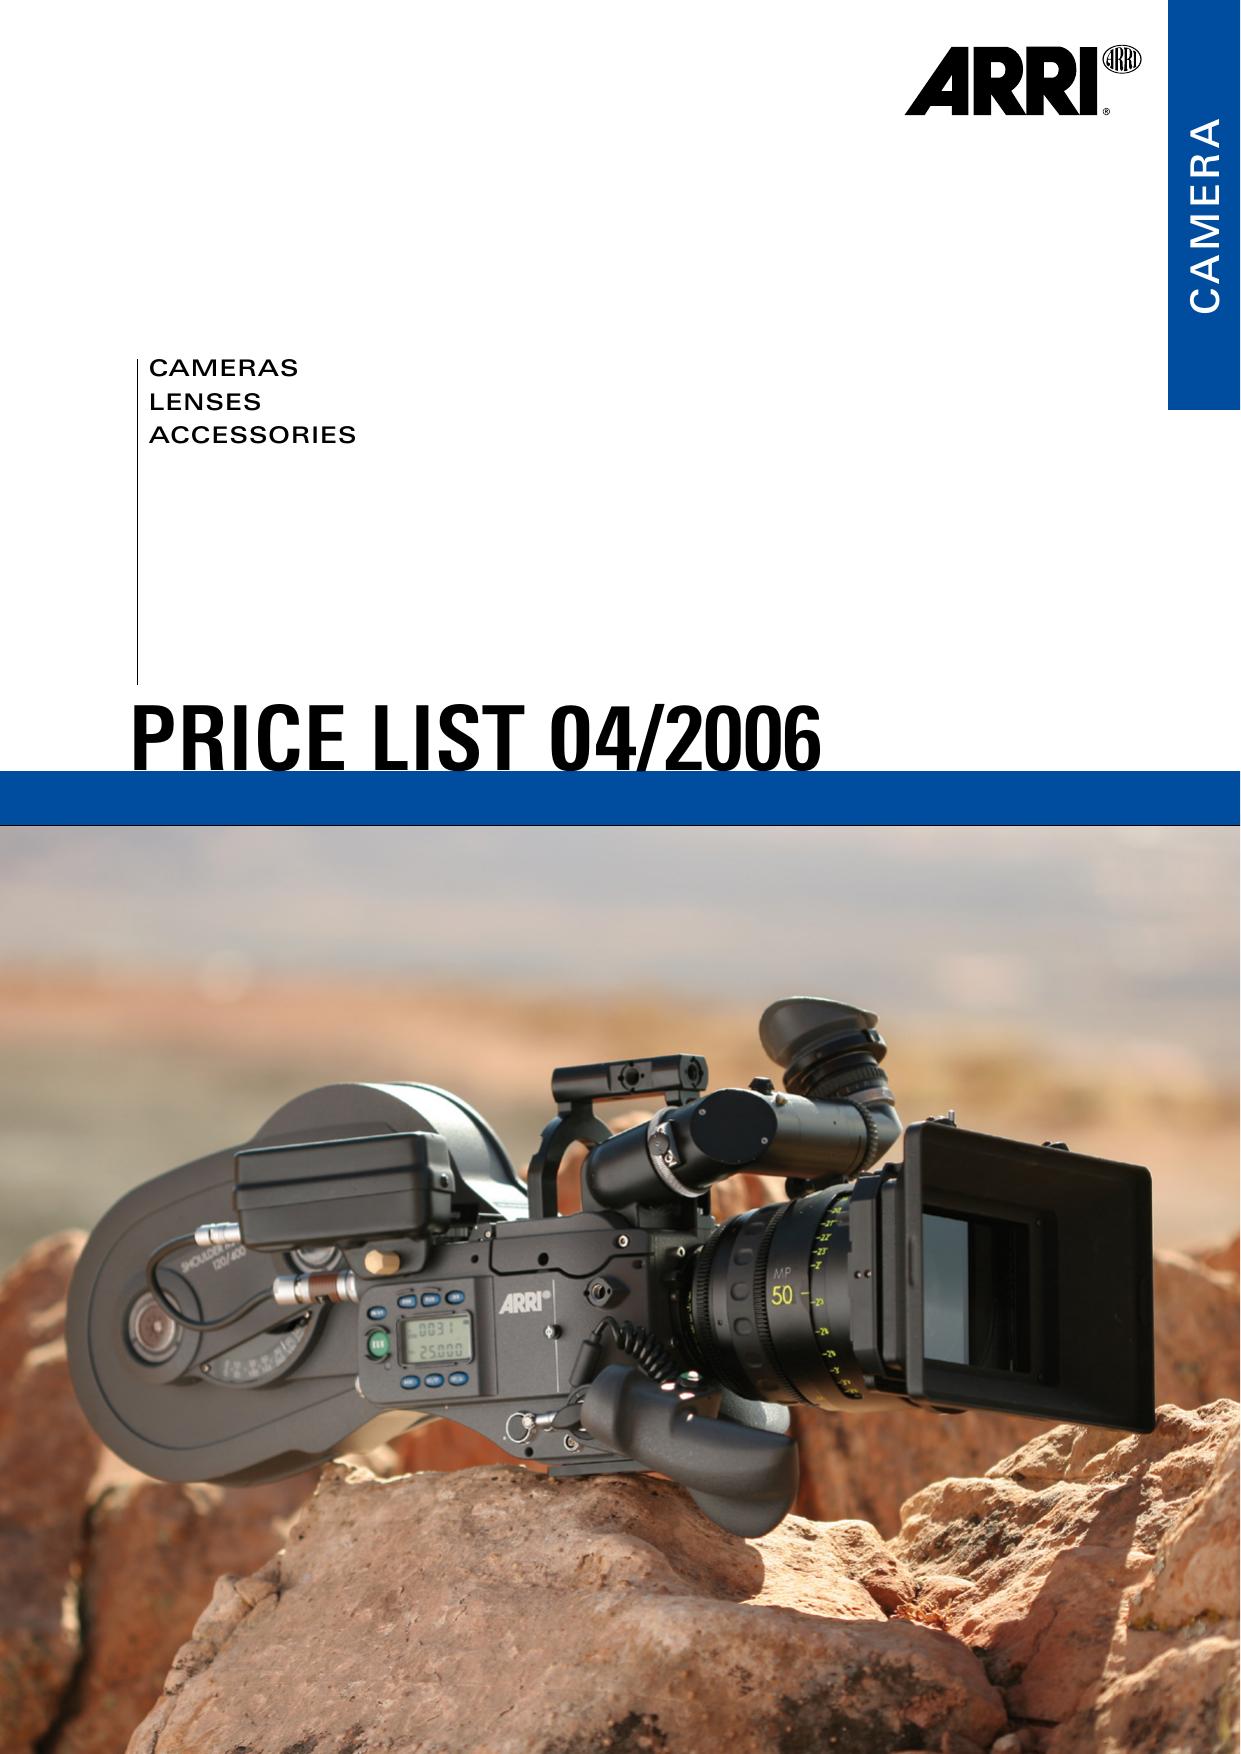 Arri Camera Price List, 01 April, 2006   manualzz com